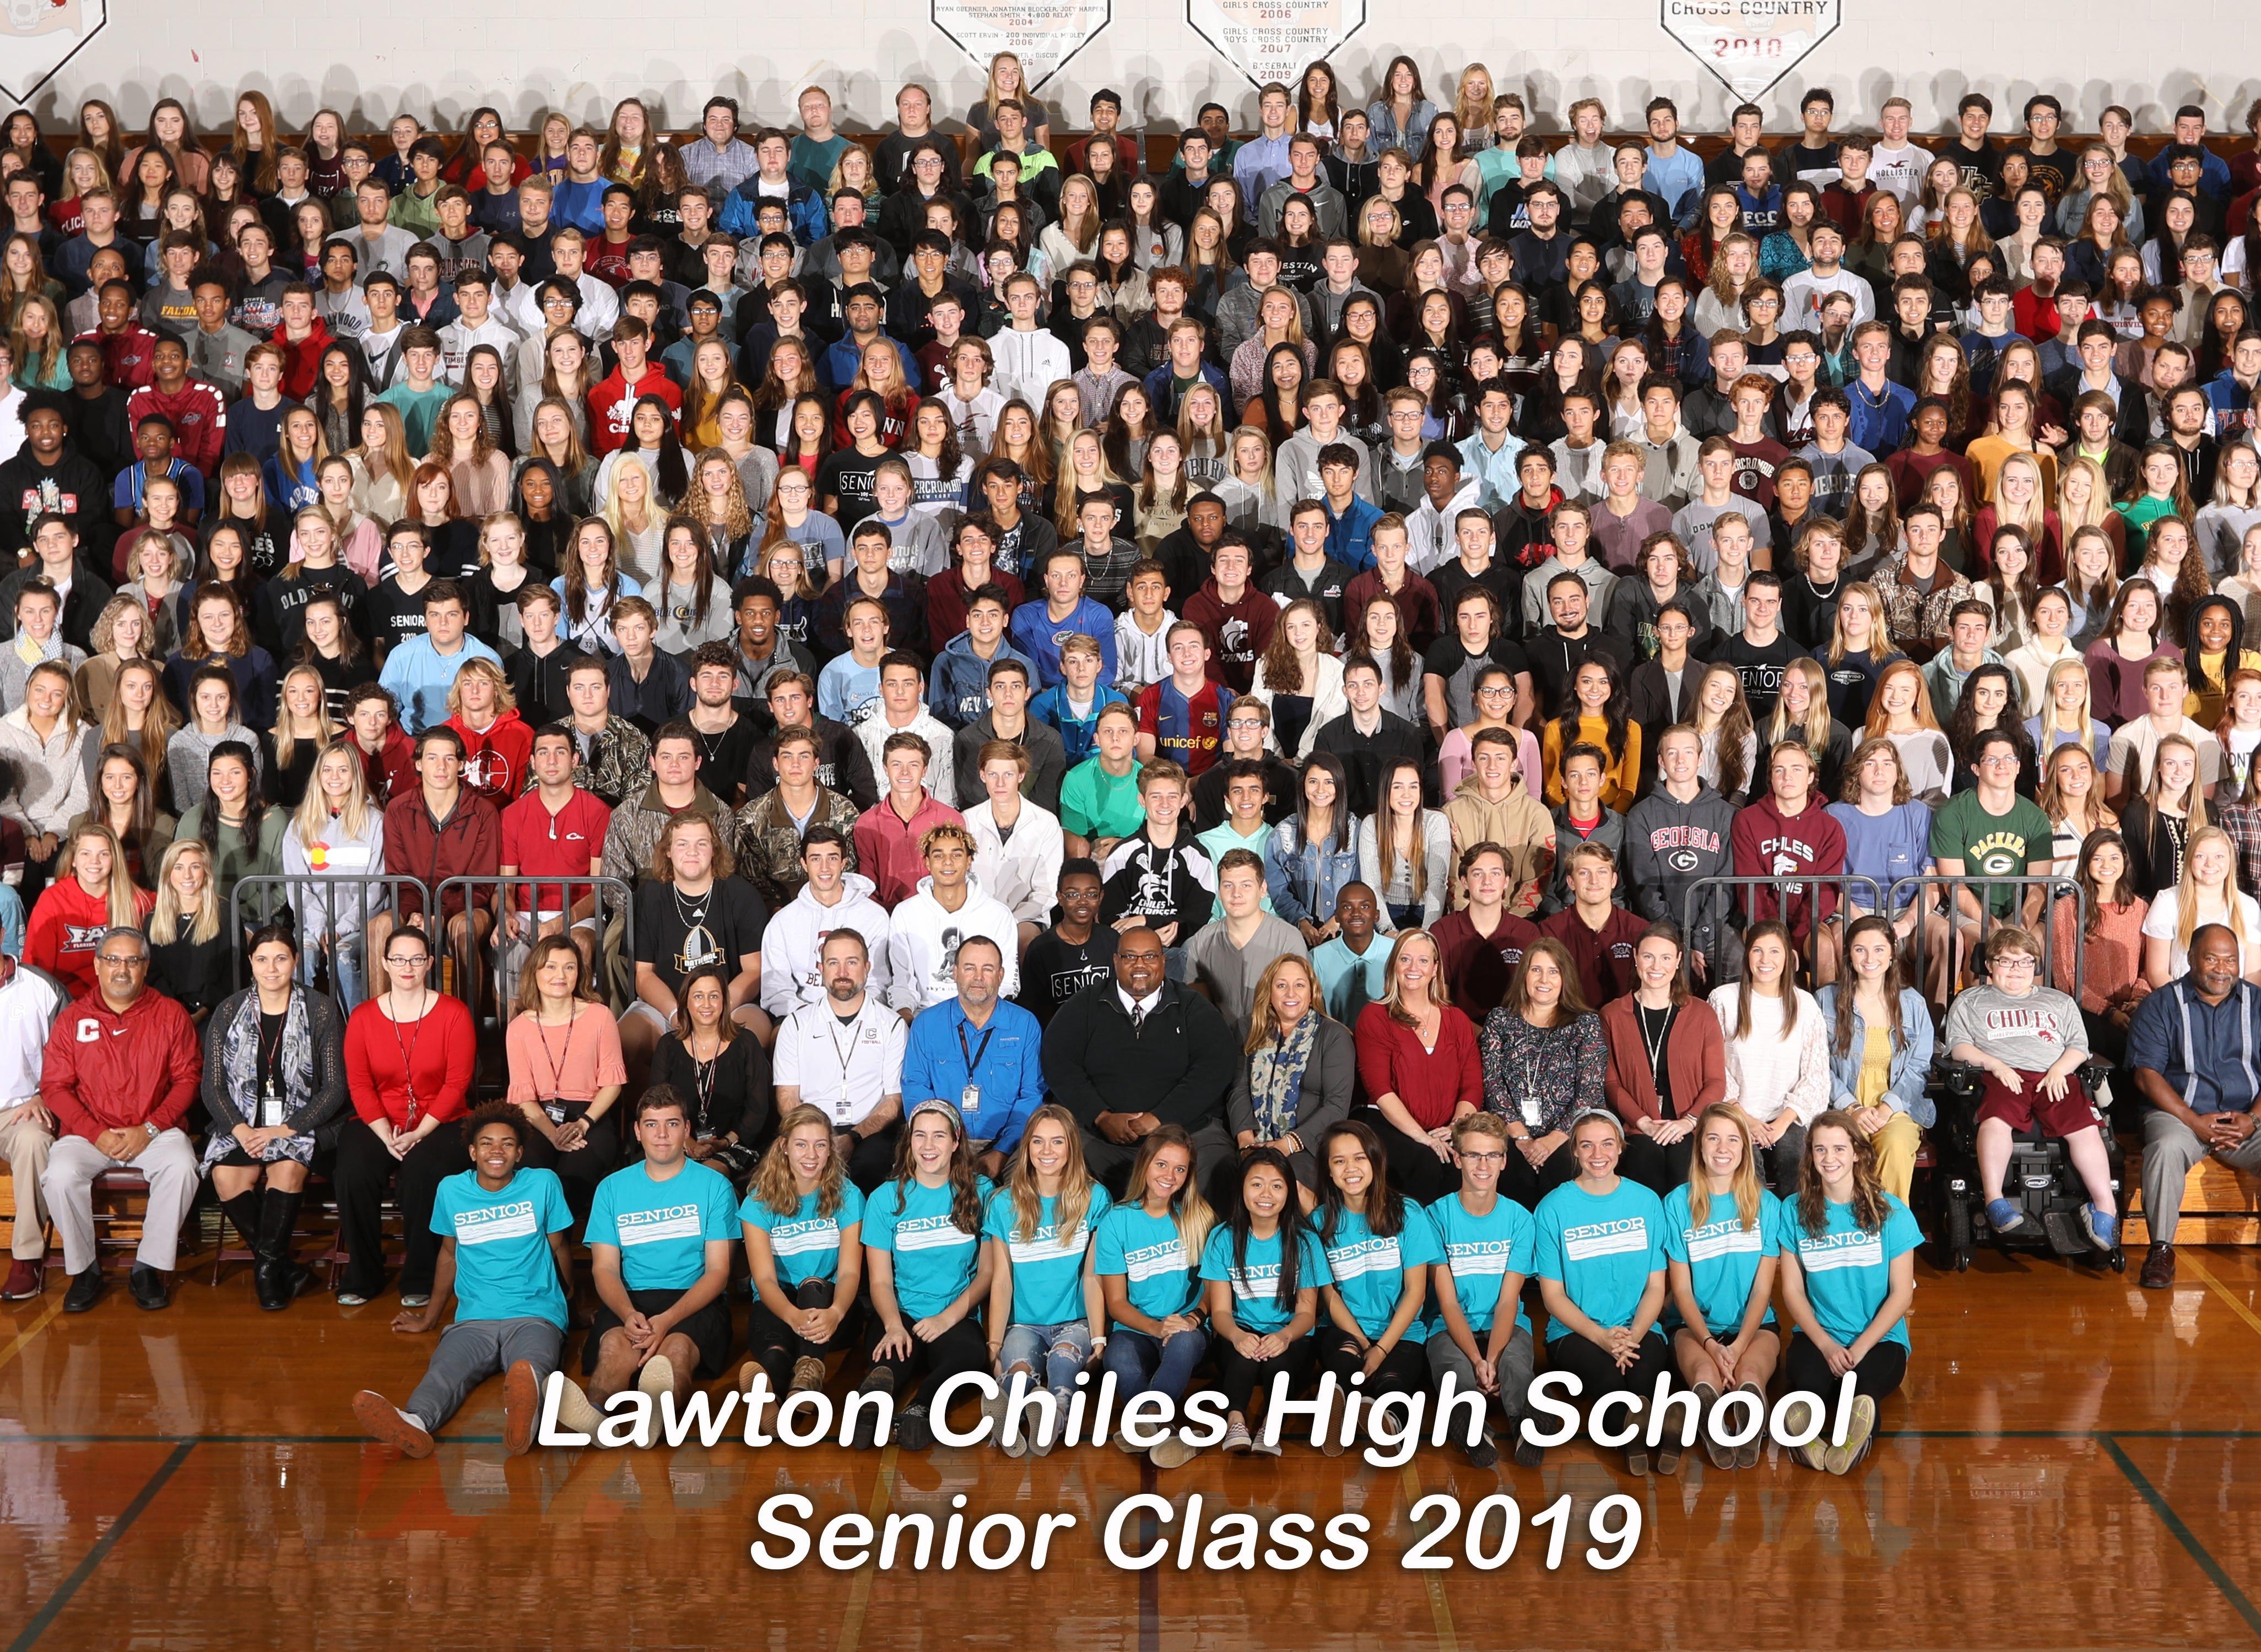 Senior Class of 2019 at Lawton Chiles High School Class.